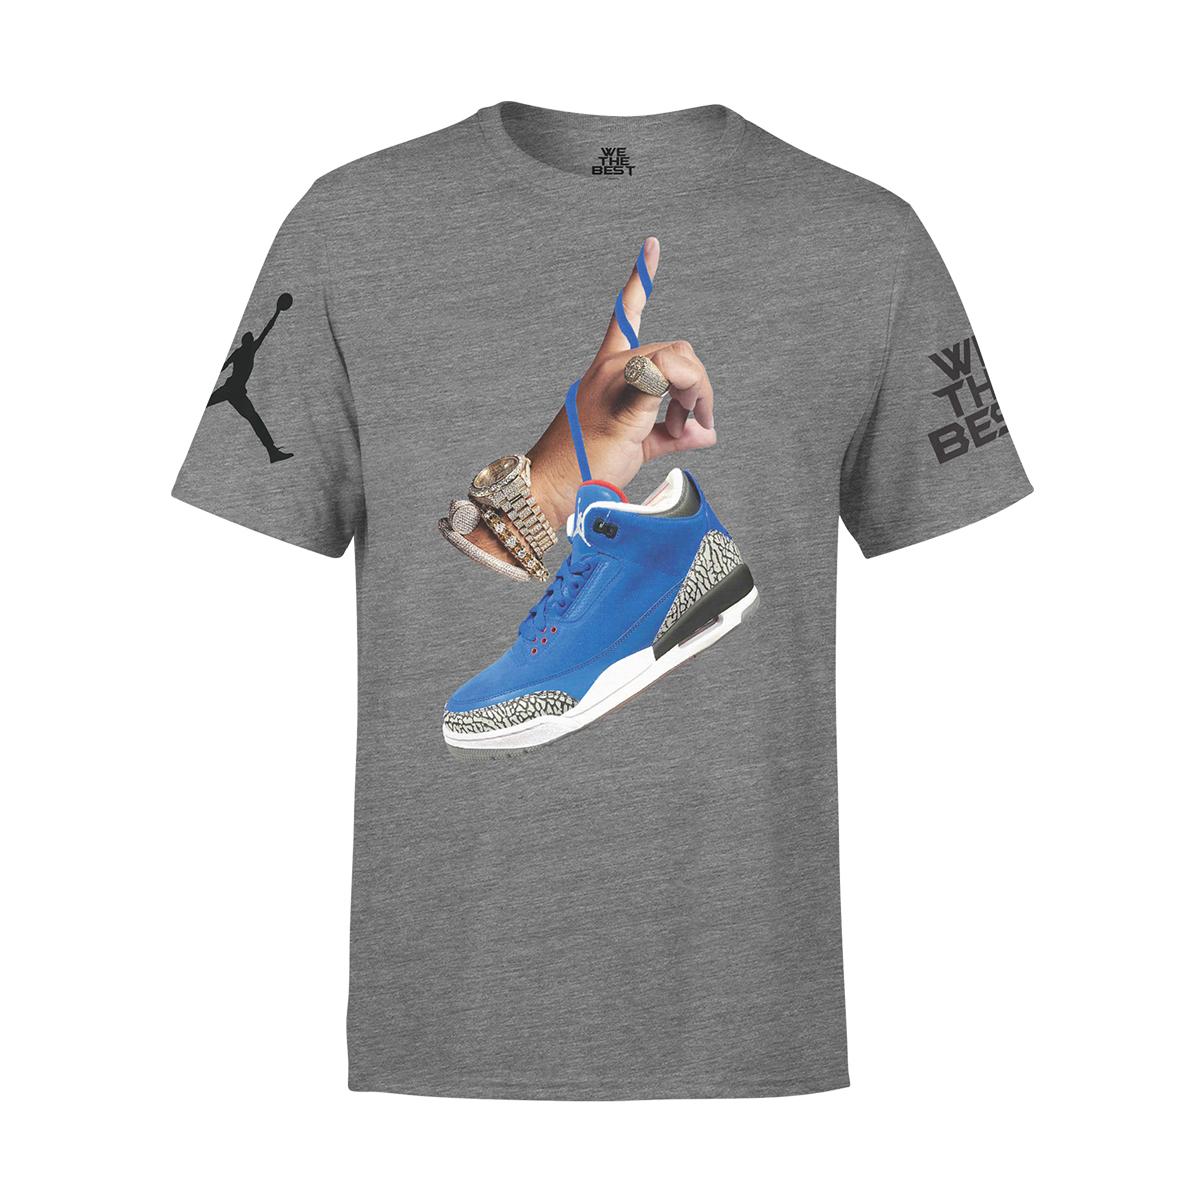 DJ Khaled x Jordan Suede Sneakers T-shirt - Grey